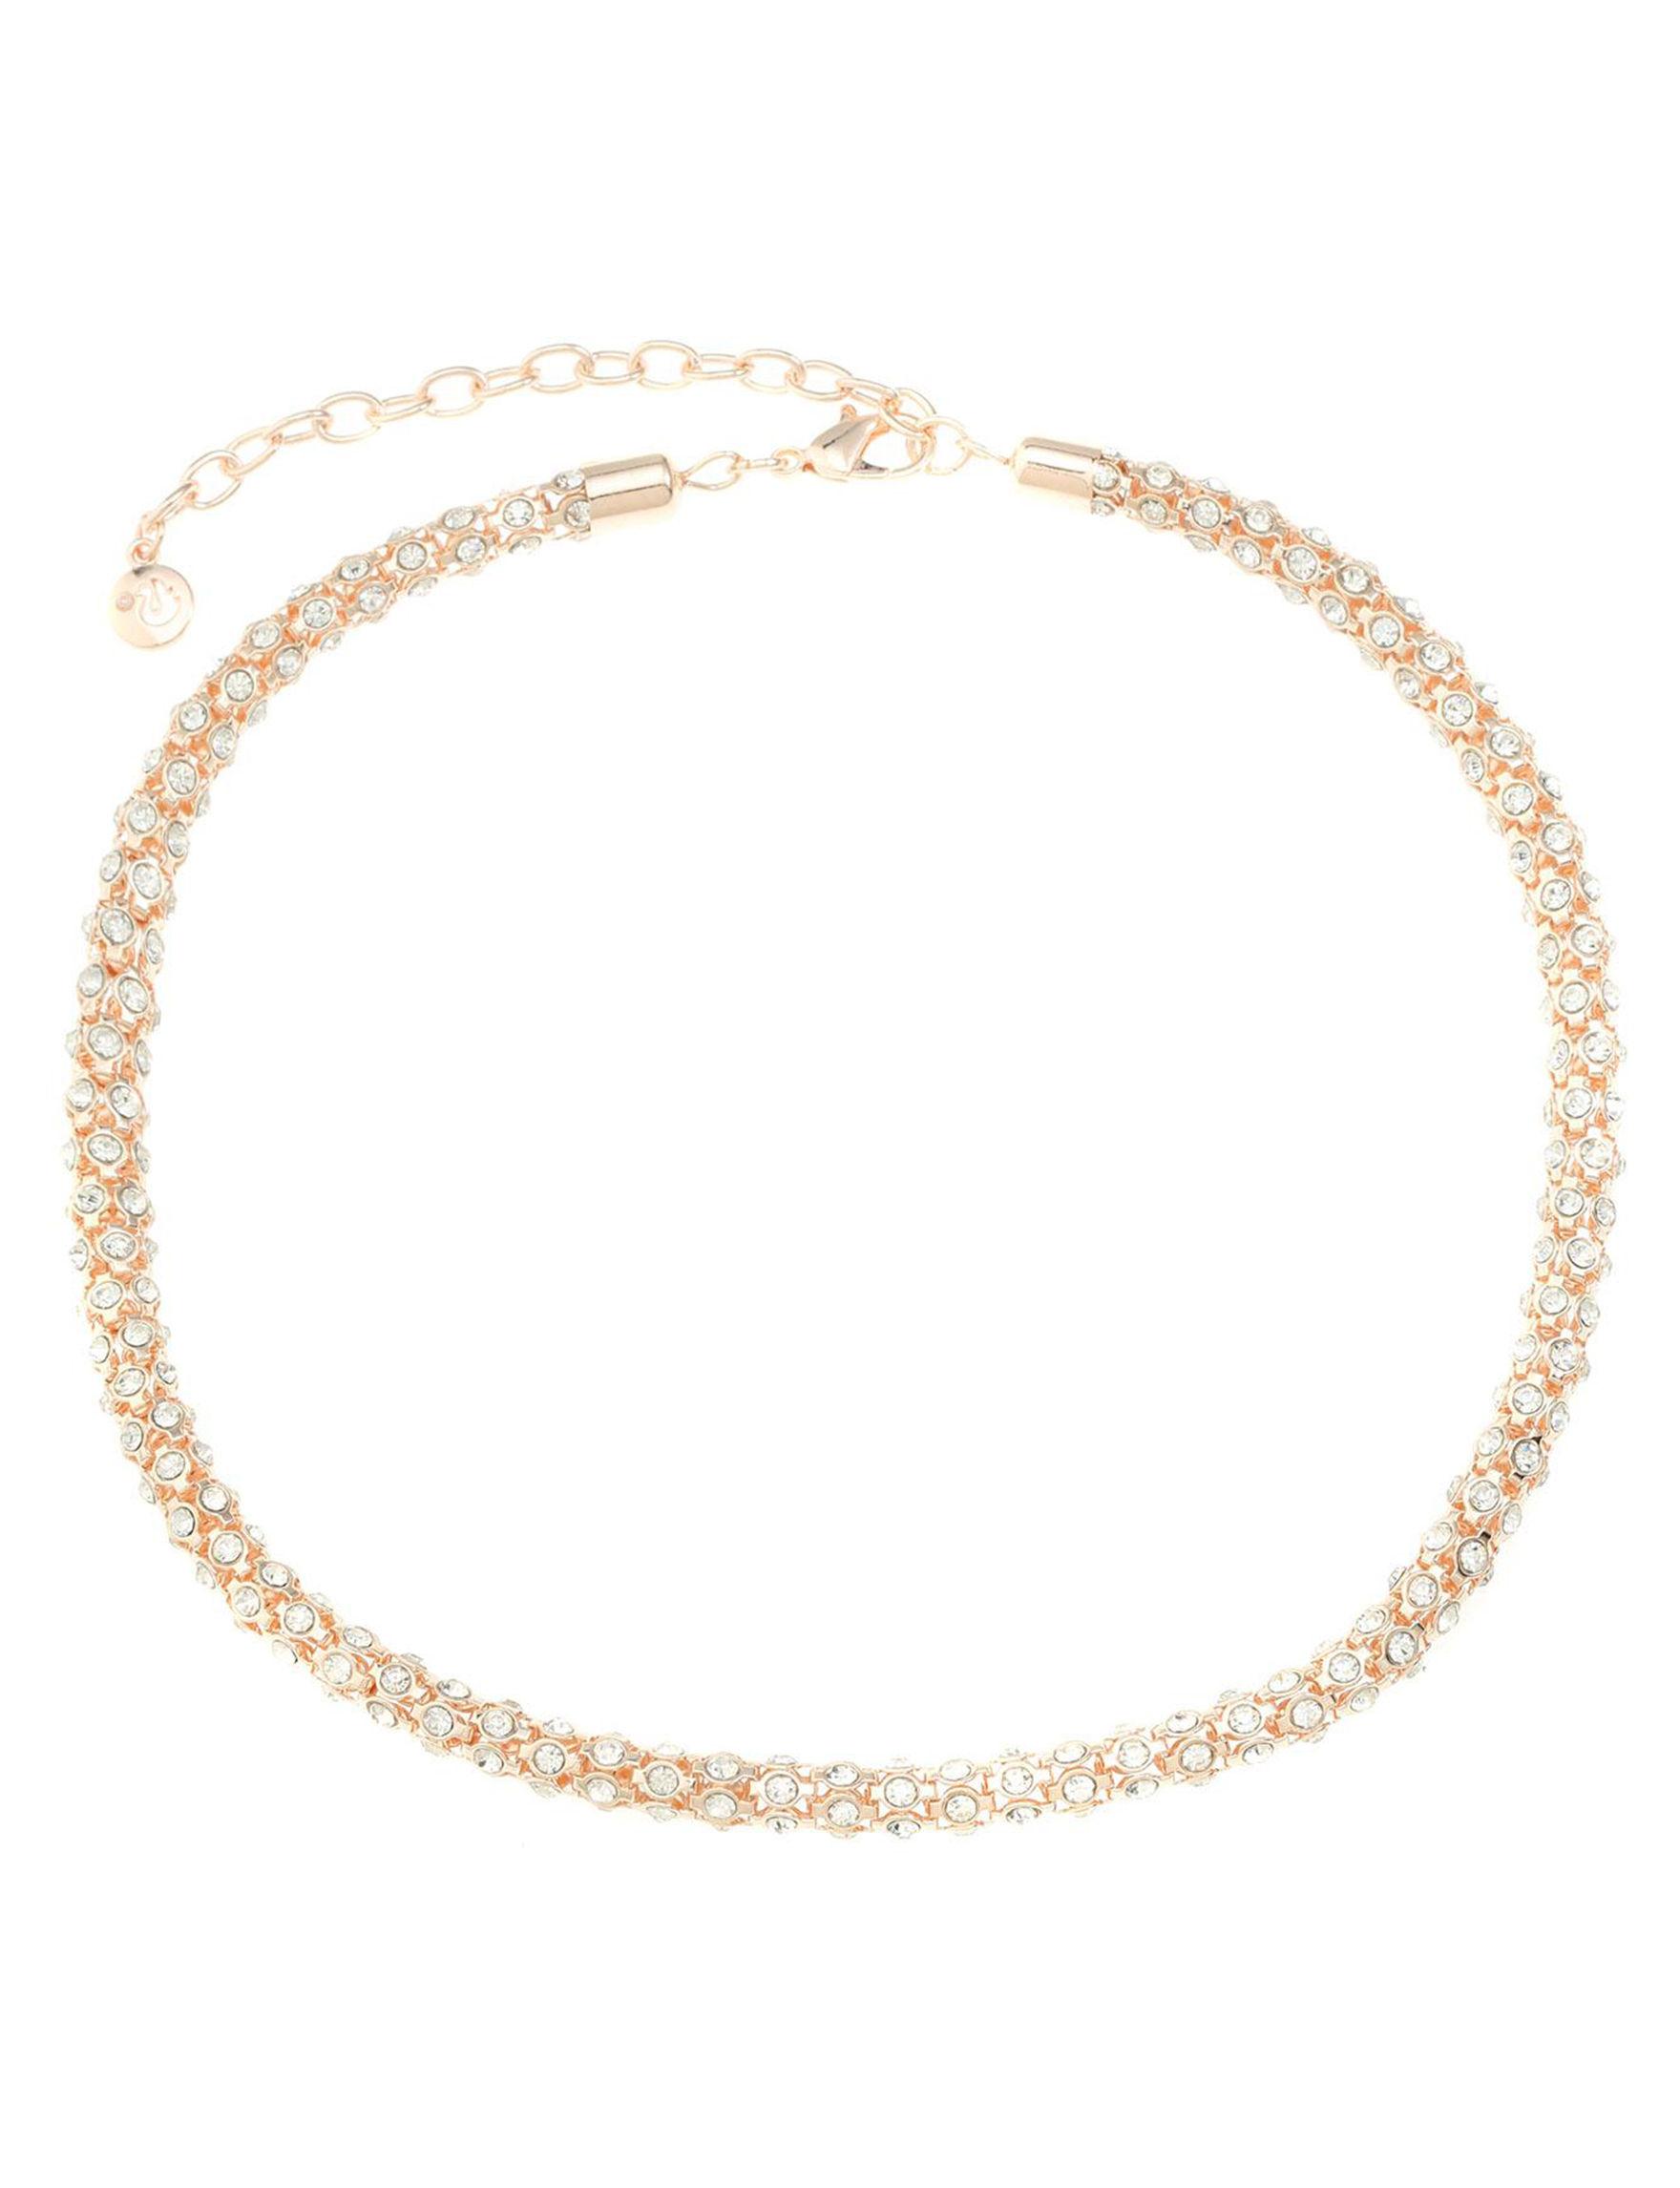 Gloria Vanderbilt Rose Gold Necklaces & Pendants Fashion Jewelry